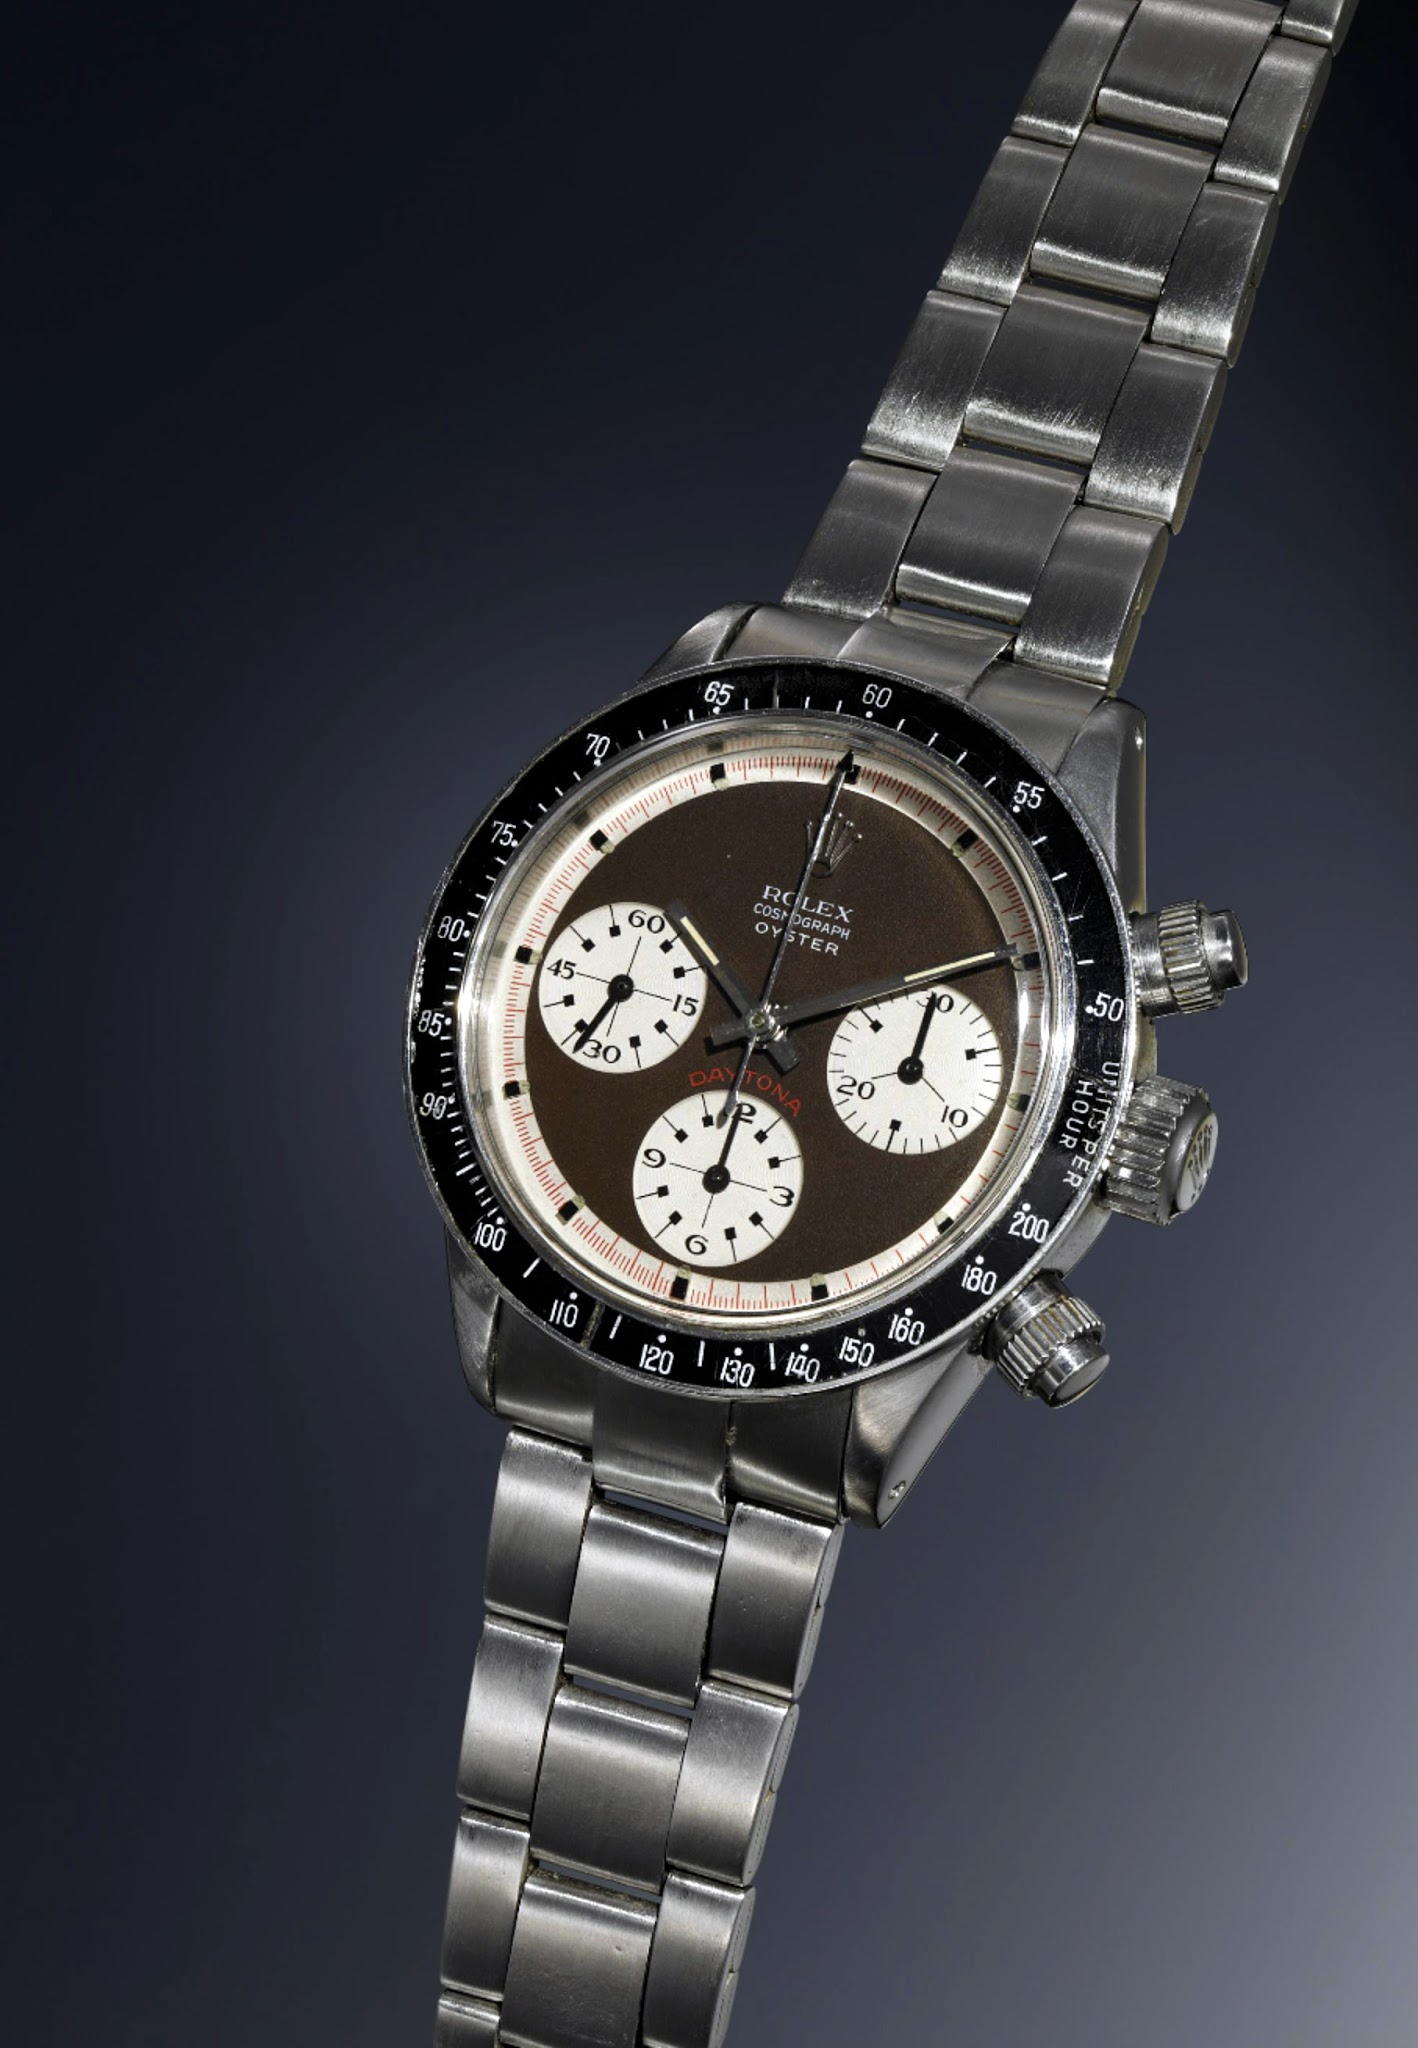 fa997fe94c8 Record Set For Rolex Daytona Phillips.com Sells for More than  2 Million!!!